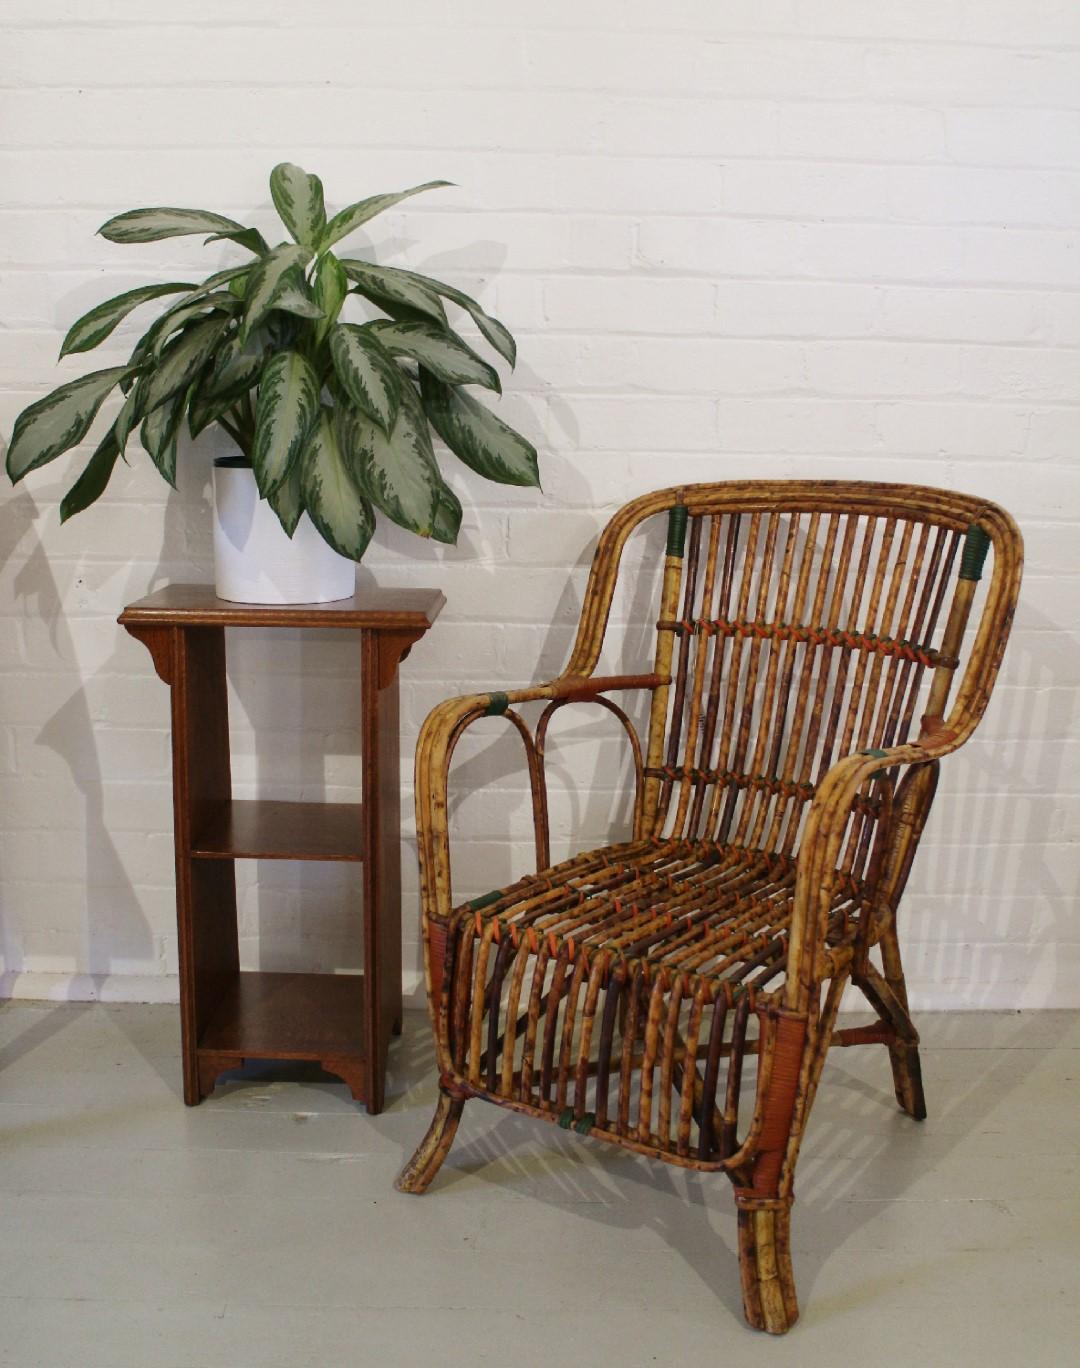 Vintage Cane Chair (Large).jpg